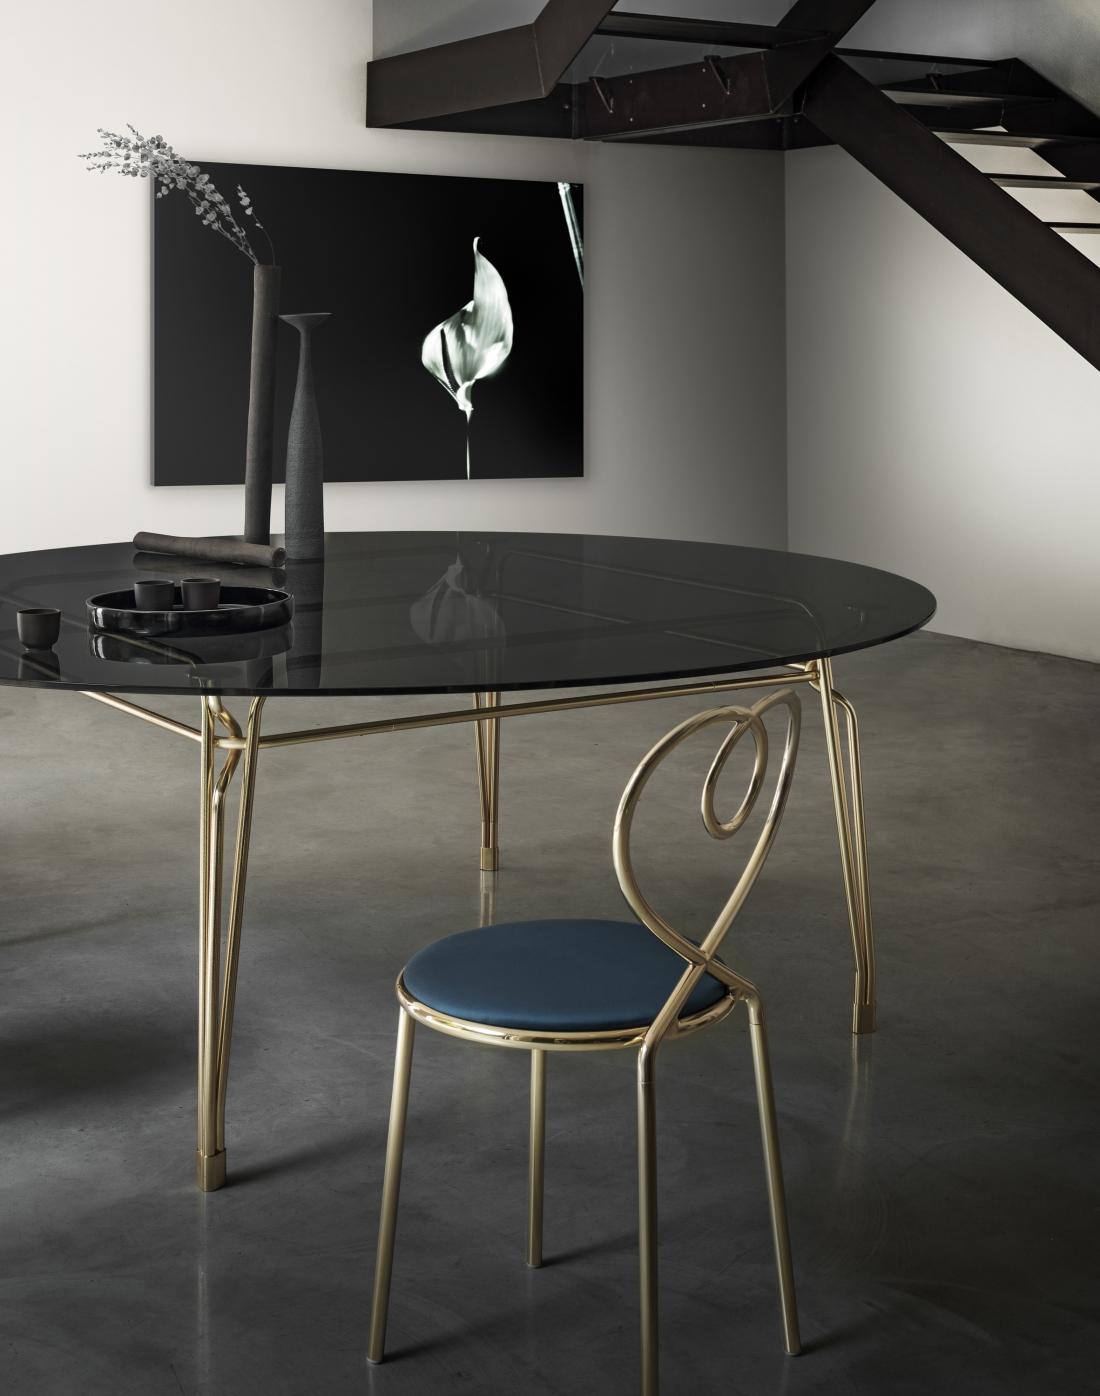 15 Botany table Love chair detail Fabrizio Bergamo